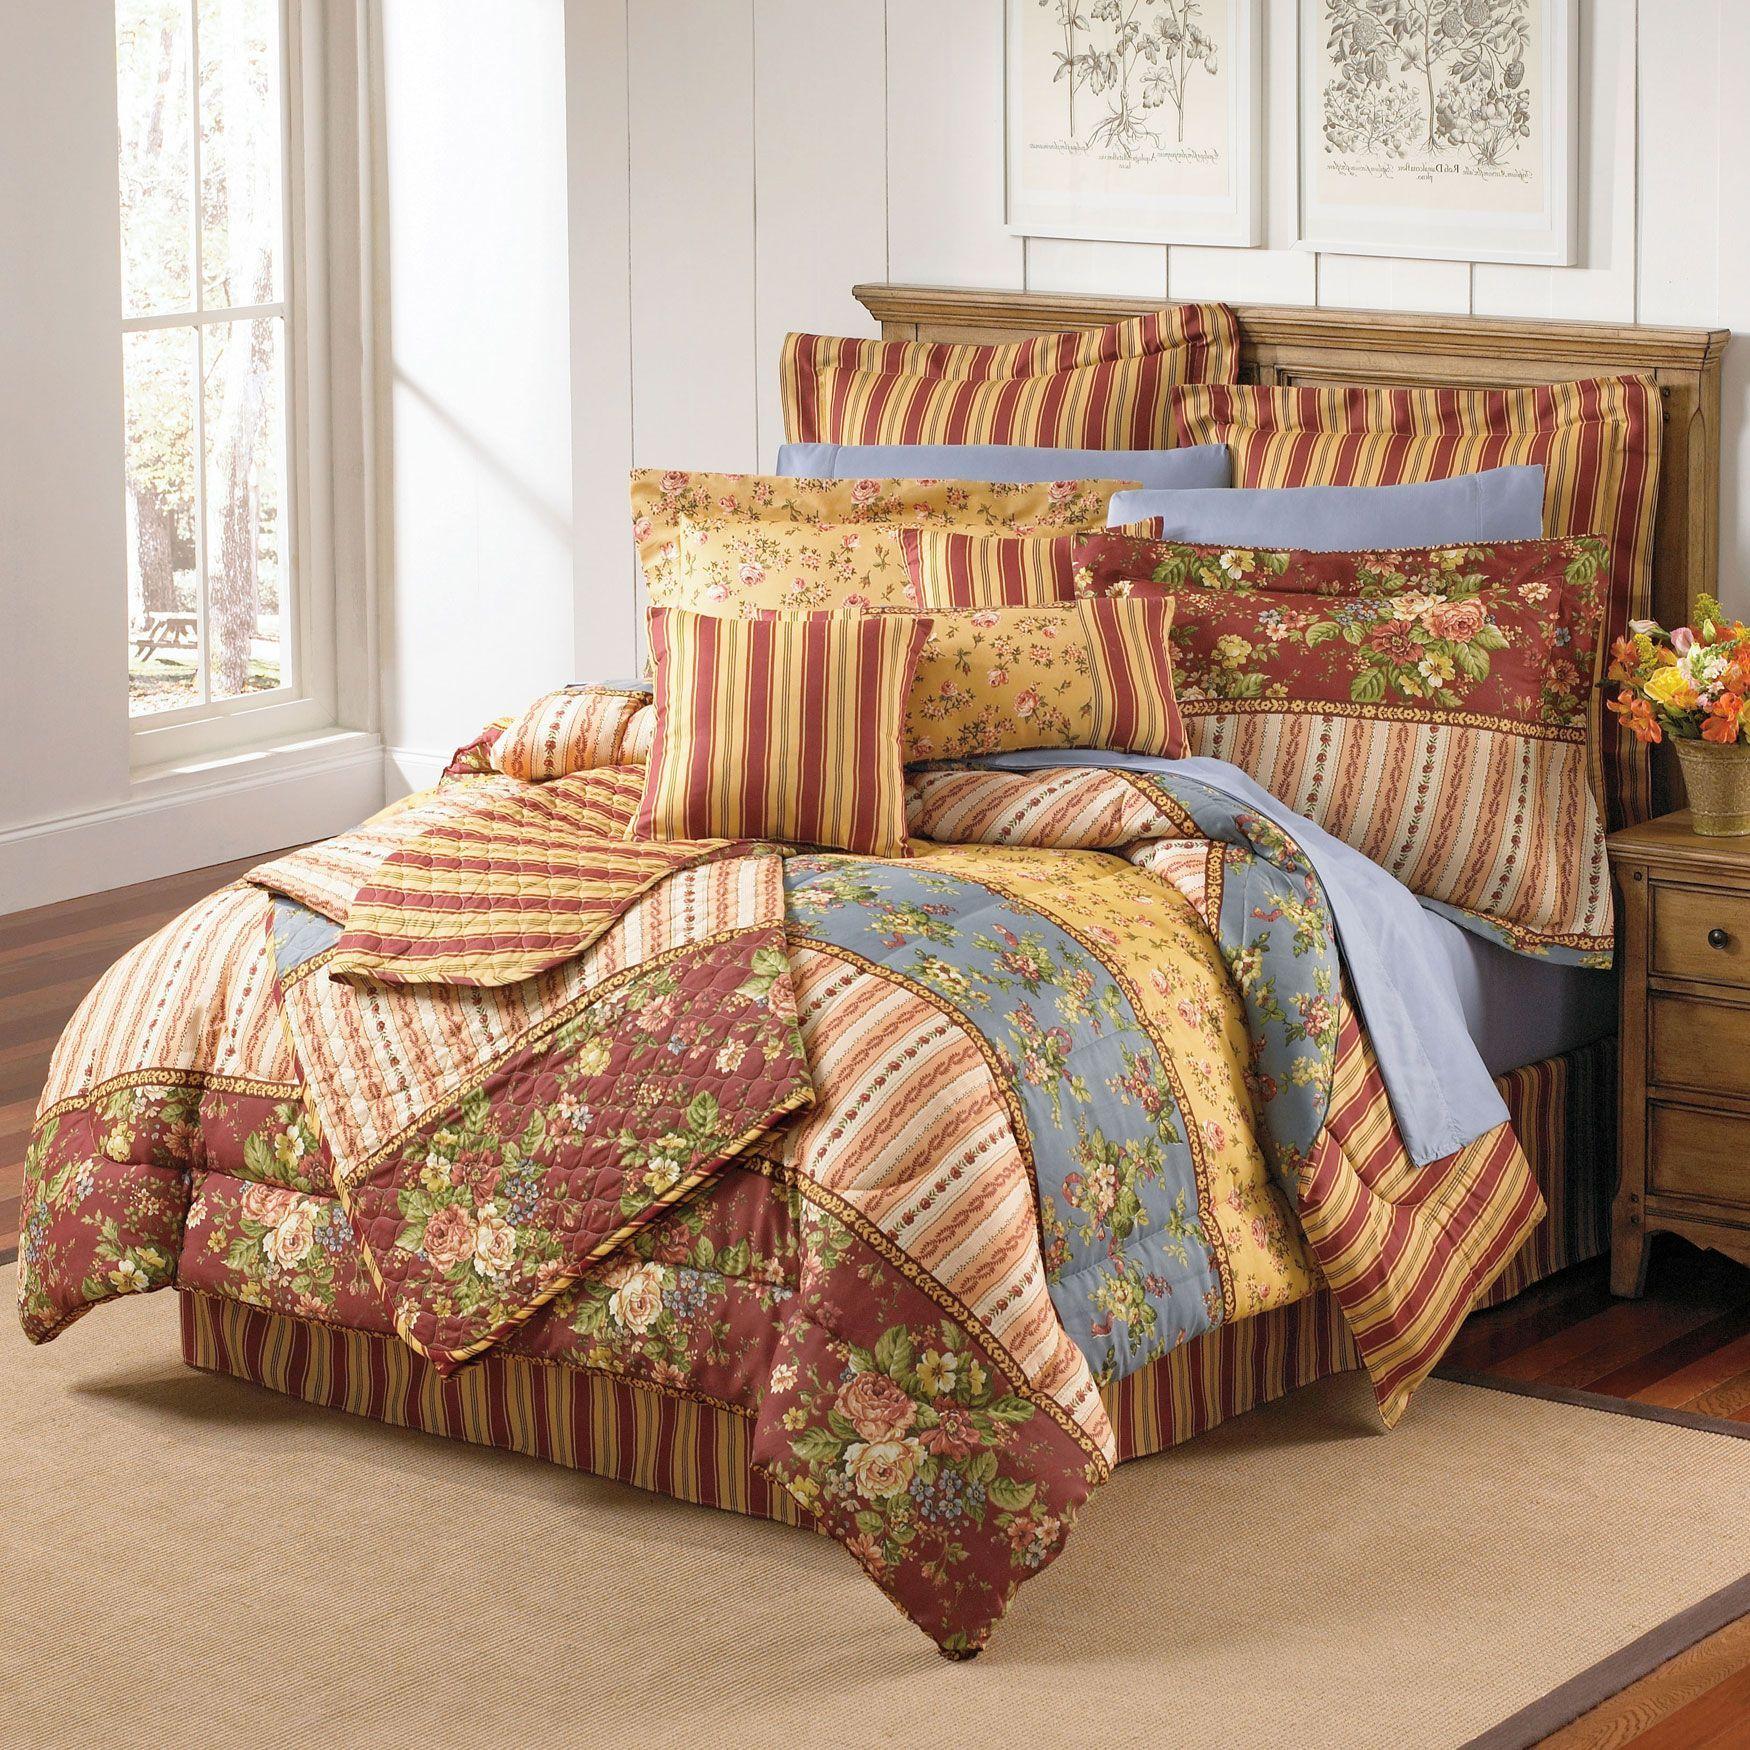 Bedding bath kitchen home decor curtains rugs furniture wall